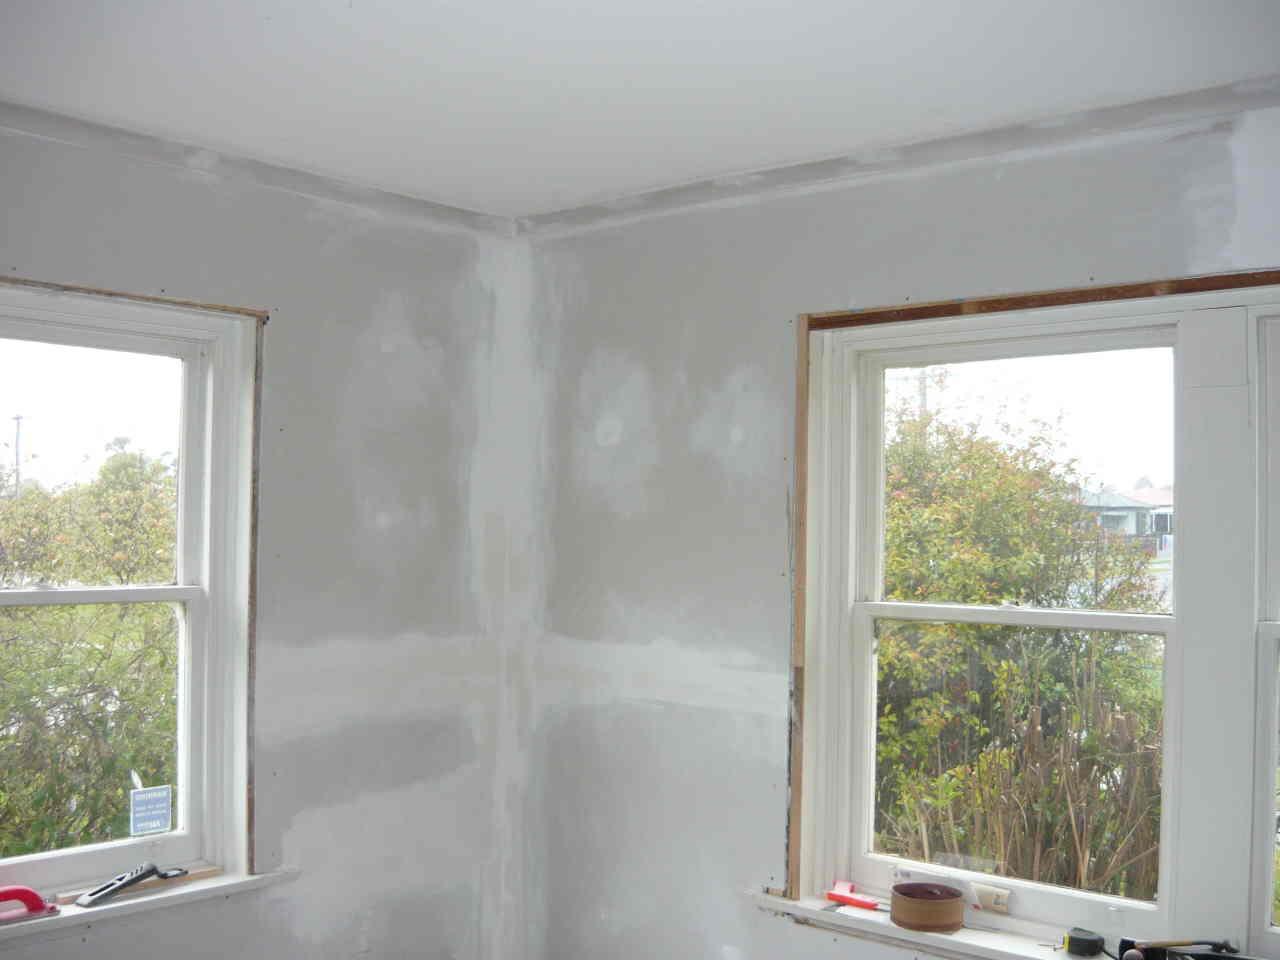 new plasterboard & cornice